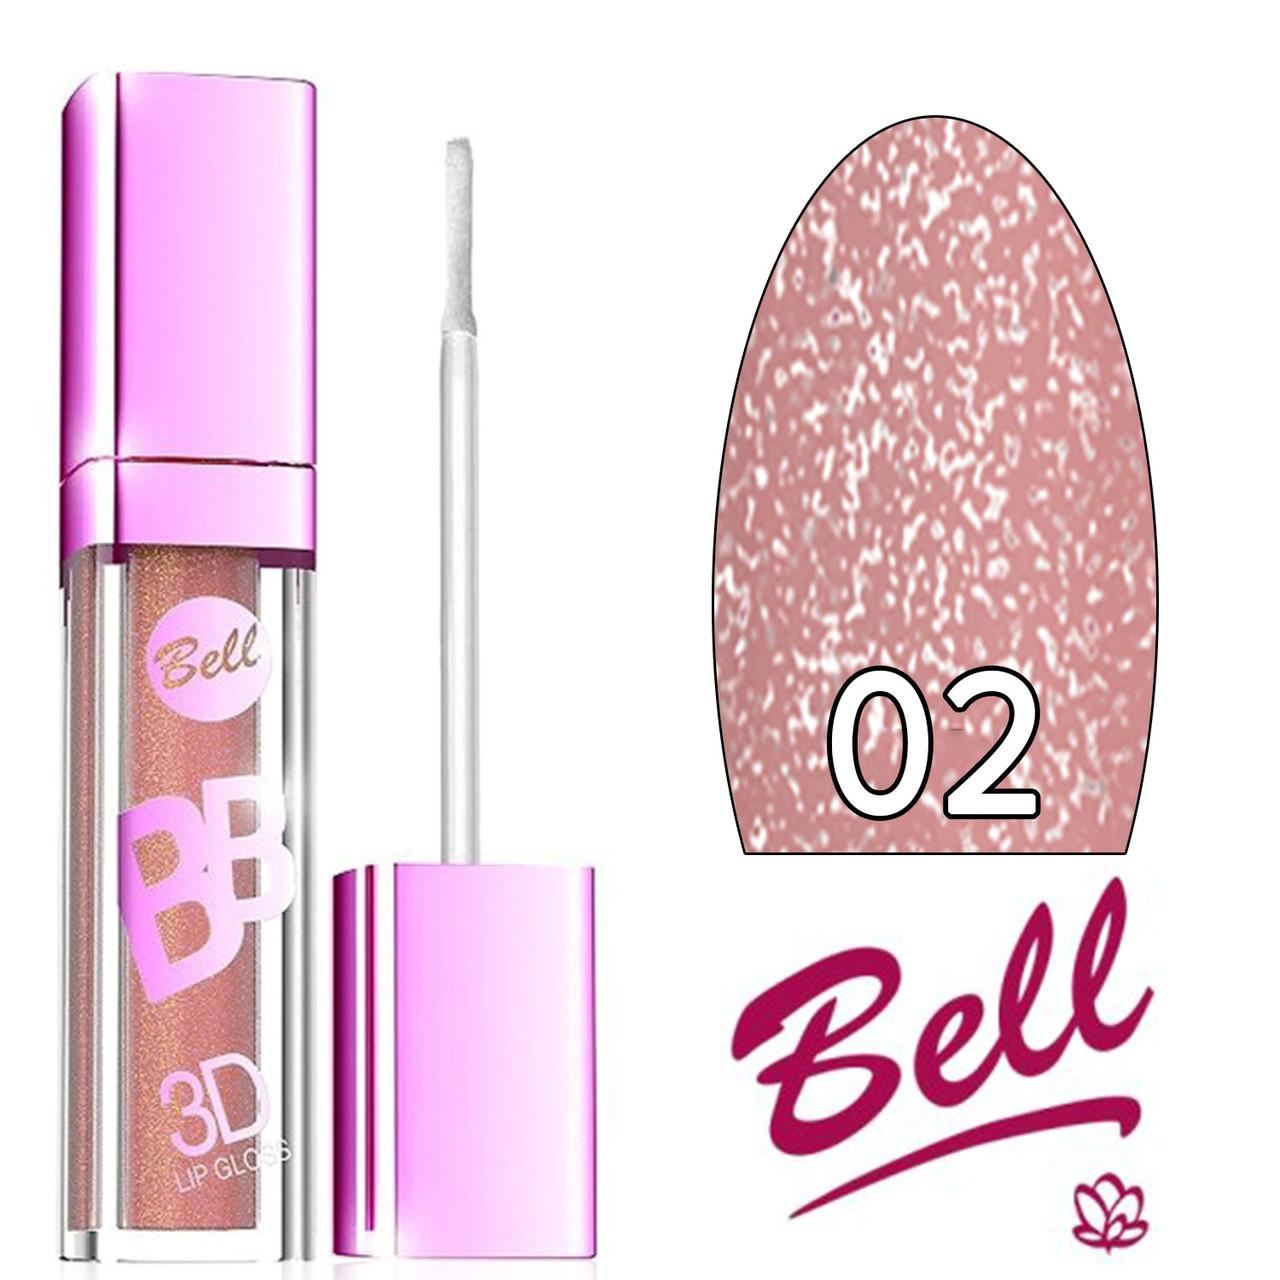 Bell - Блеск для губ BB 3D LipGloss Тон №02 pink nude мерцающий